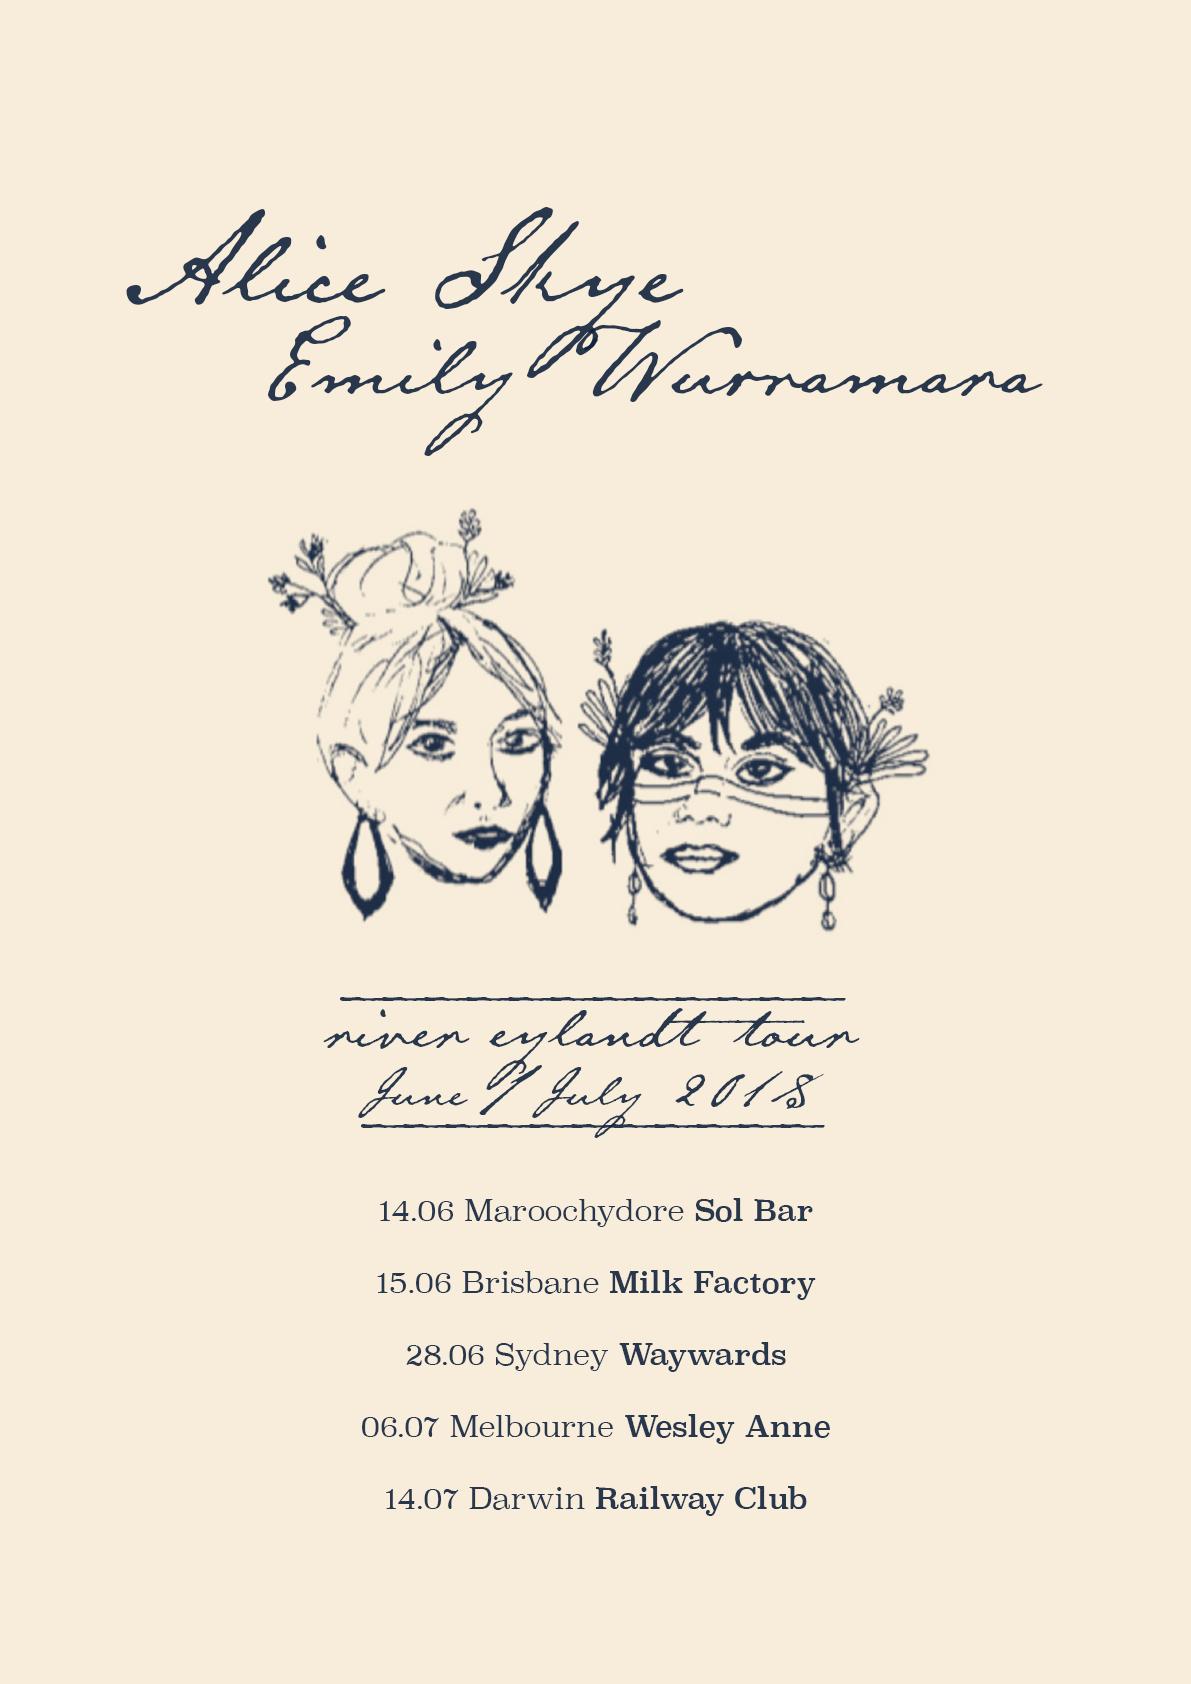 River Eylandt Tour - Social Cover Art - Drawing By Alice Skye.jpg